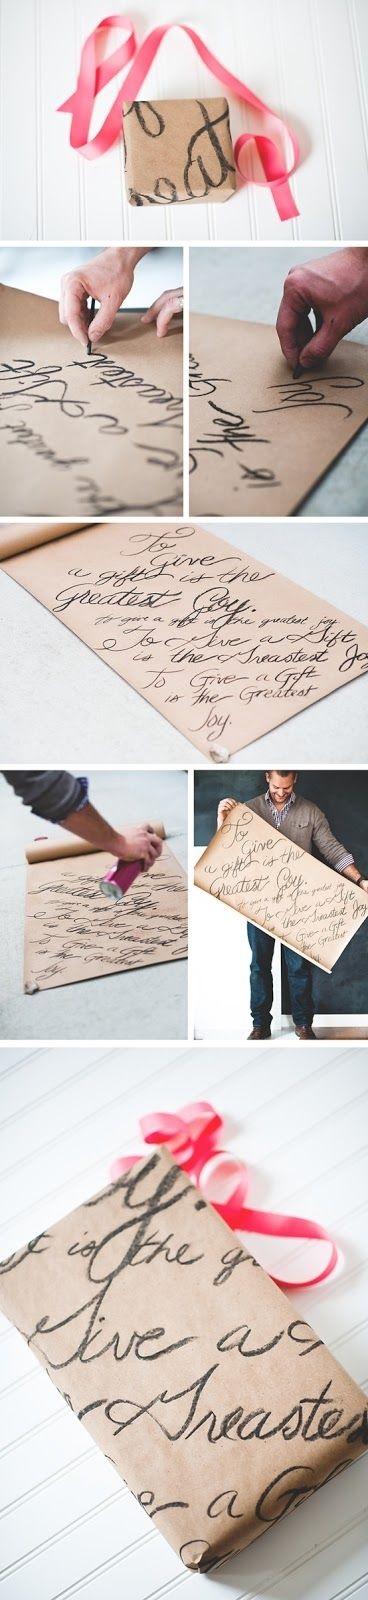 san valentin cards14